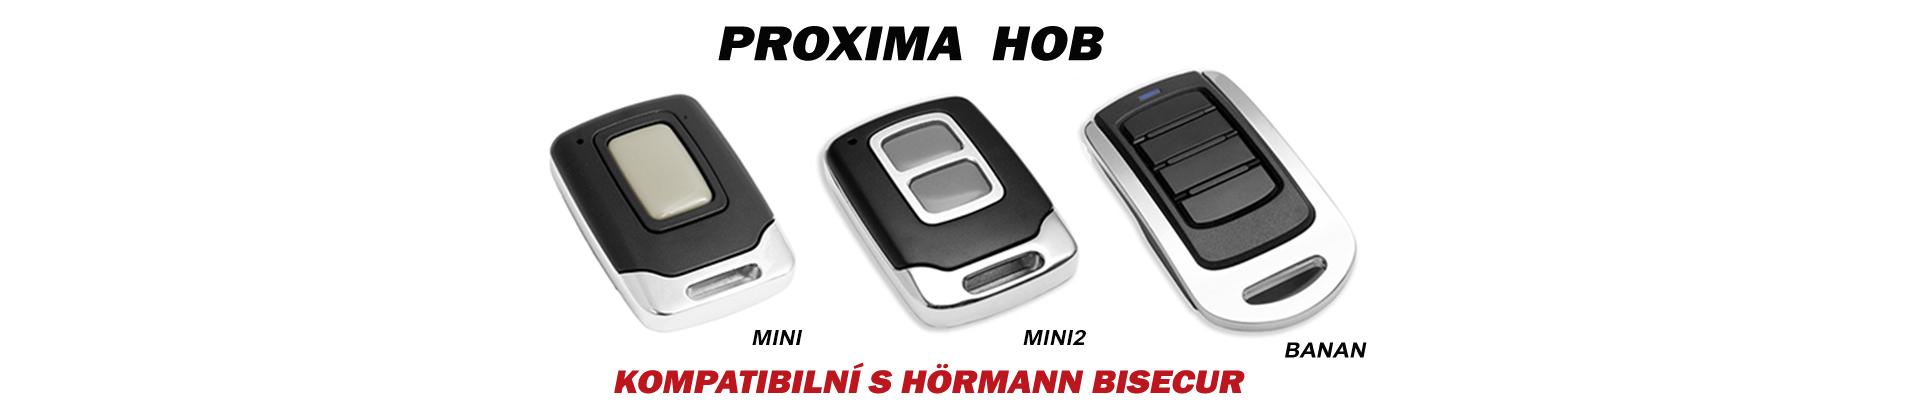 Proxima HOB MINI, MINI2, BANAN - Hörmann BiSecur